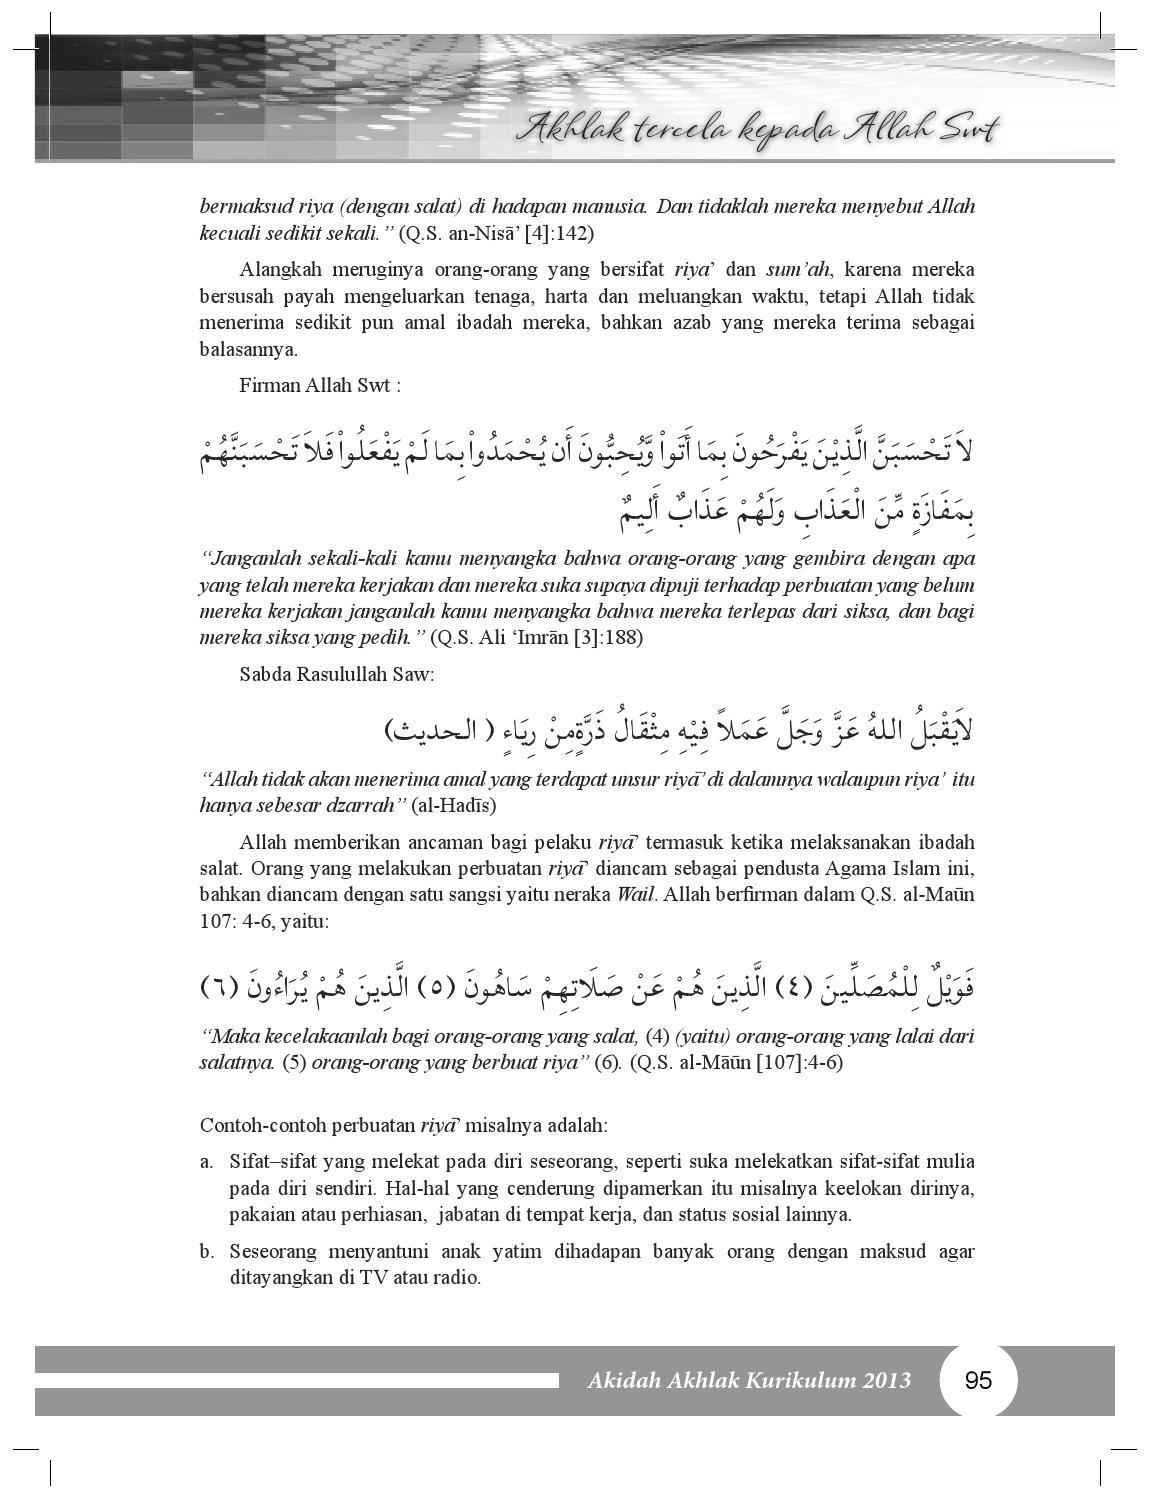 Contoh Riya Dalam Ibadah : contoh, dalam, ibadah, Akidah, Akhlak, Siswa, Madrasah, Tsanawiyah, Mandalahurip, Issuu